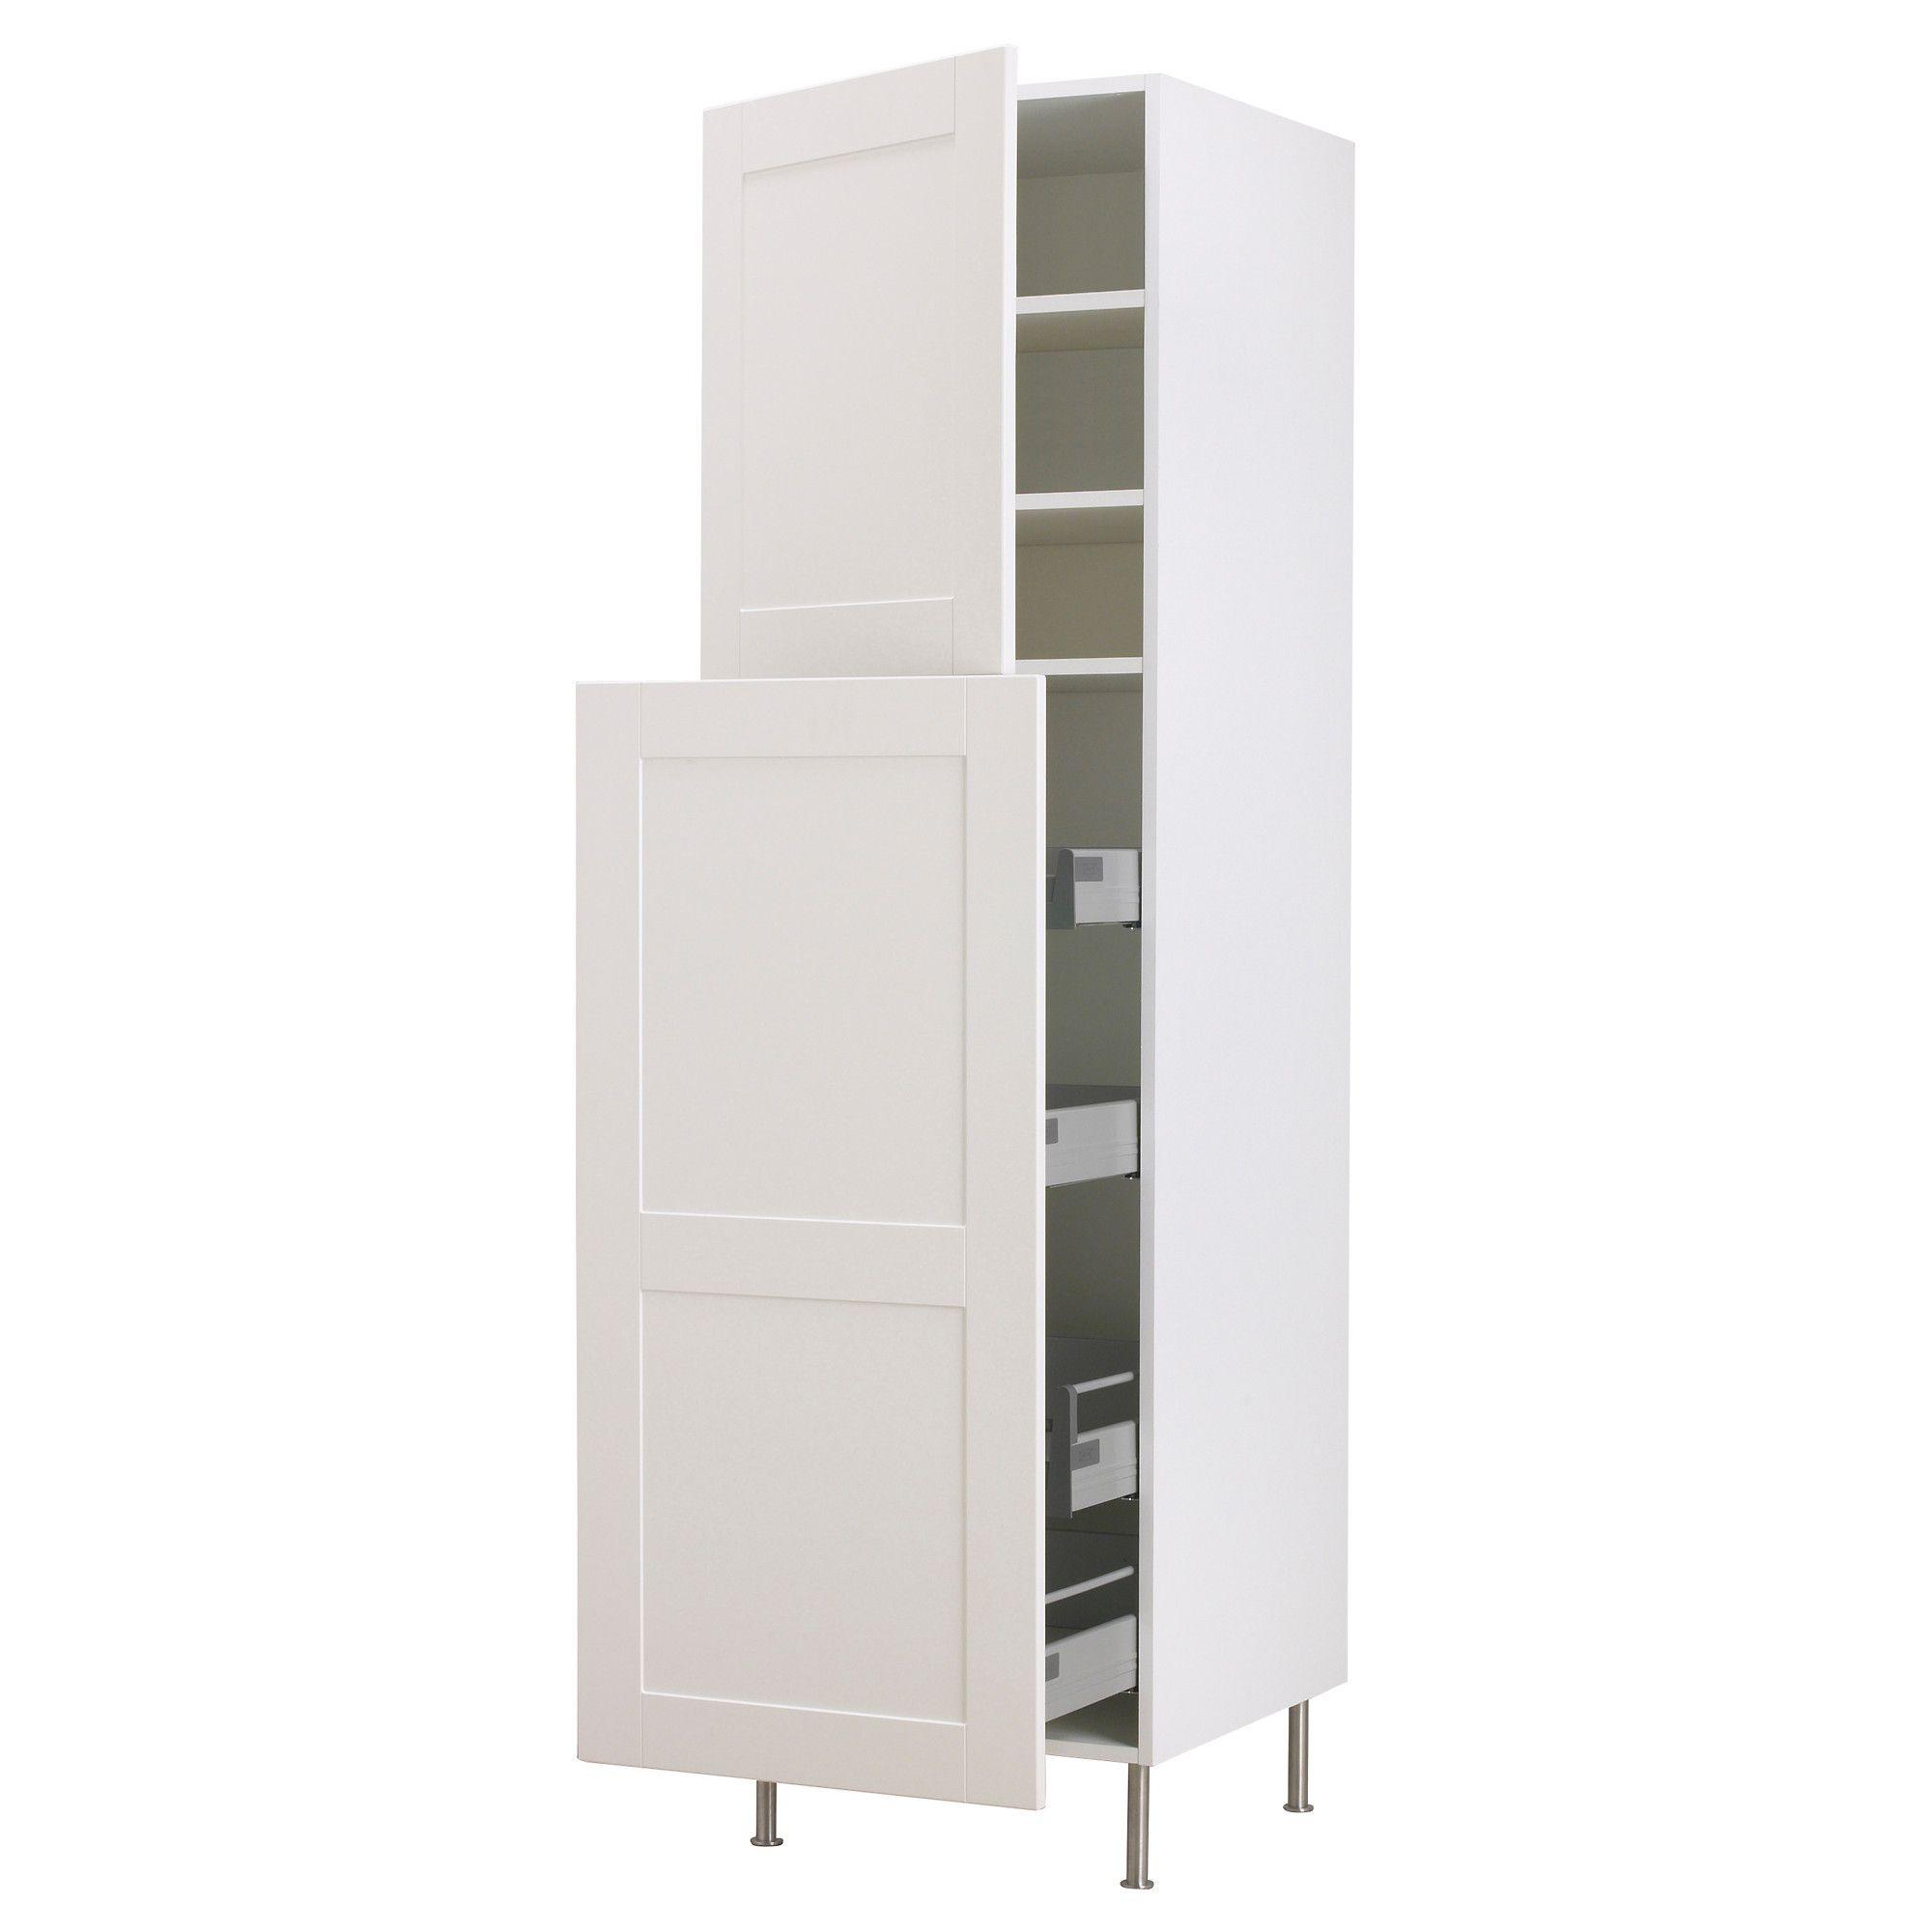 Kitchen Storage Furniture Ikea Faktum High Cab W Pull Out Storage 2 Doors 40x211 Cm Ikea